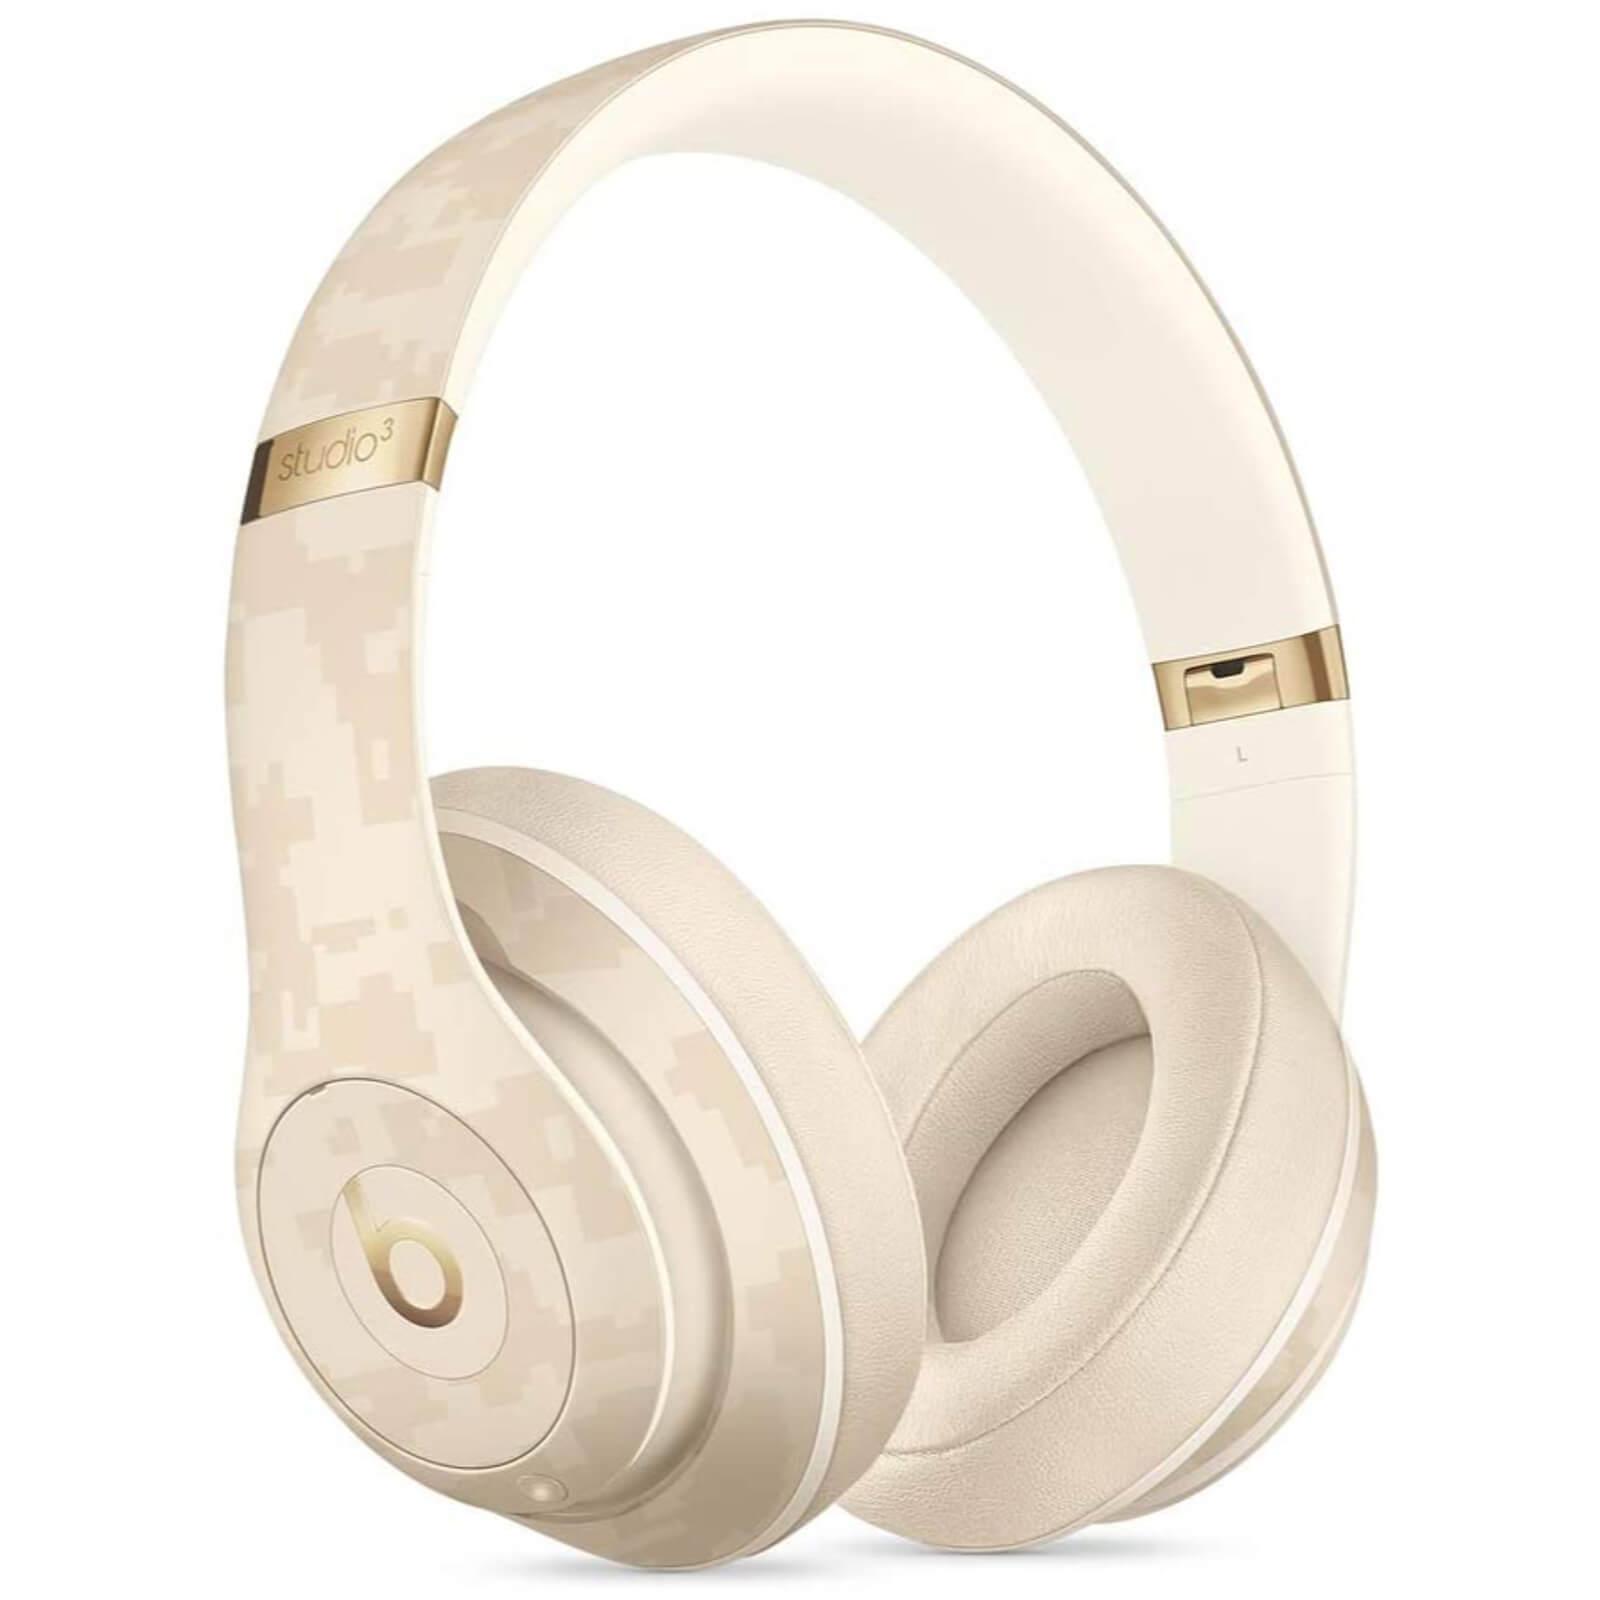 Beats Studio3 Wireless Headphones - Beats Camo Collection - Sand...